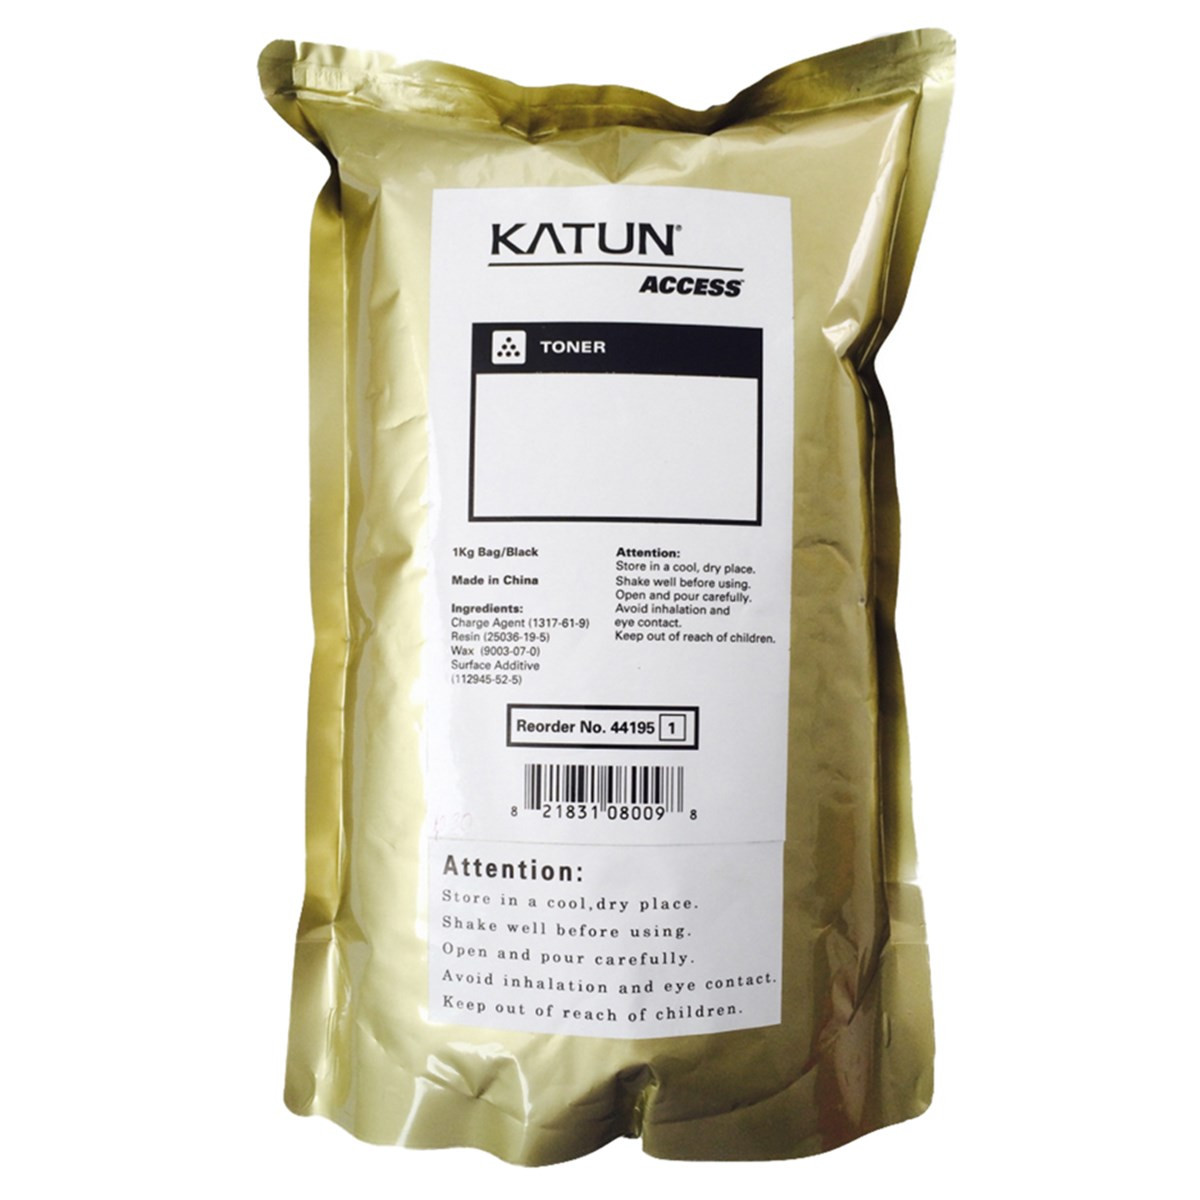 Toner em Bag Ricoh Aficio 1060 1075 841332 885400 Type 6110D 6210D | Katun Access 1kg